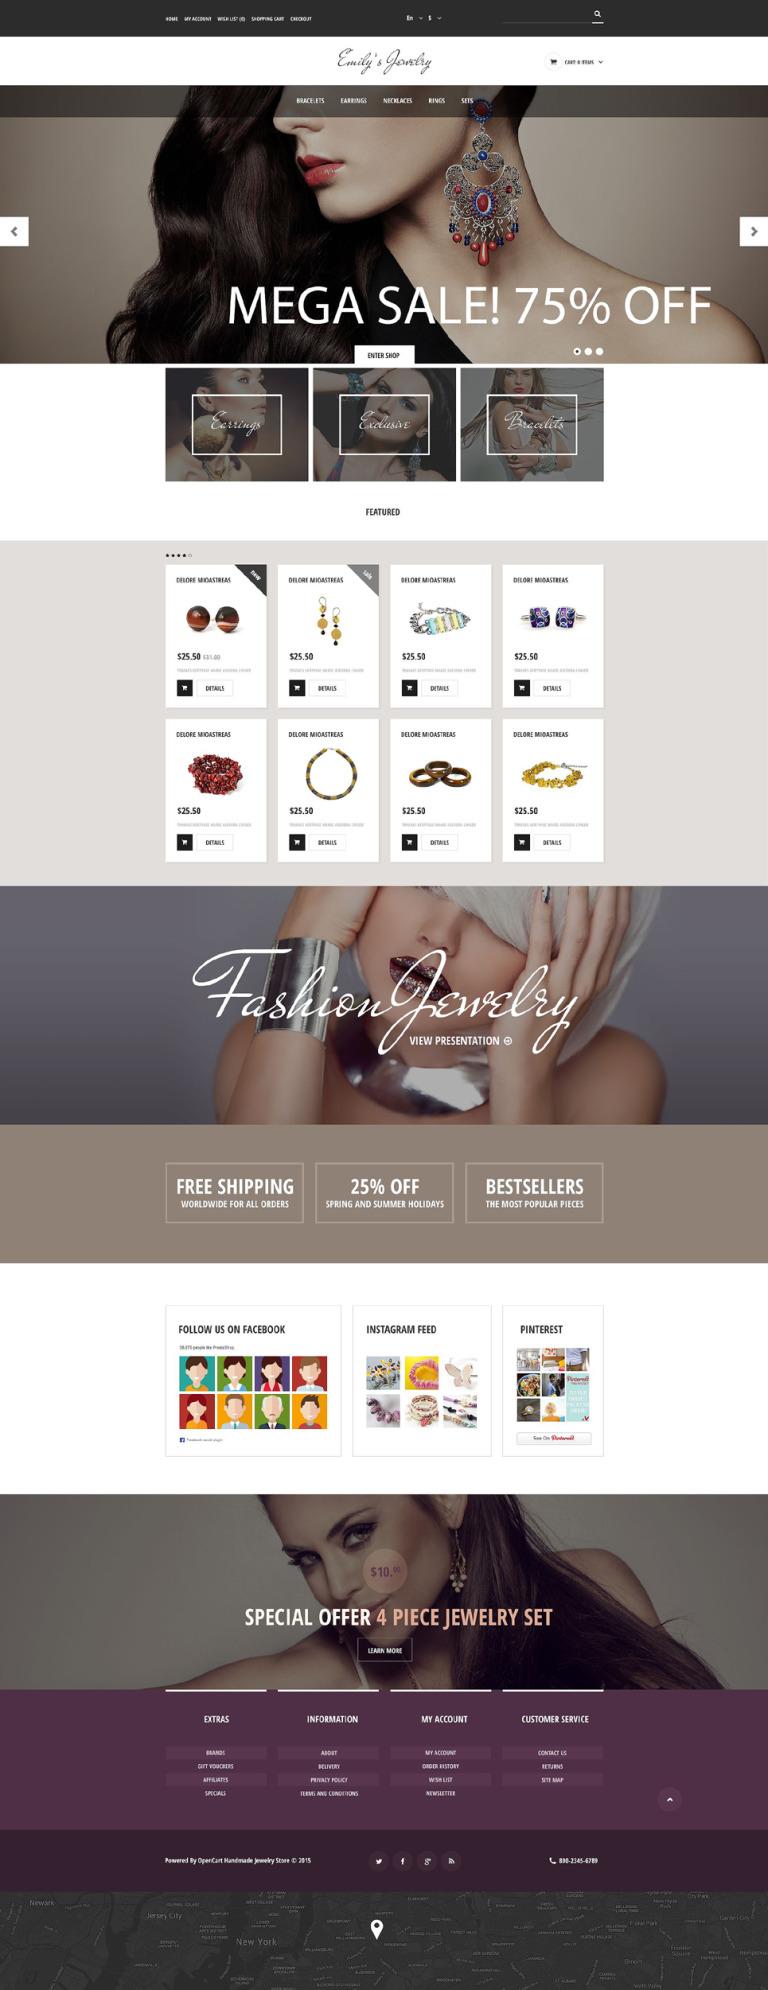 Handmade Jewelry OpenCart Template New Screenshots BIG